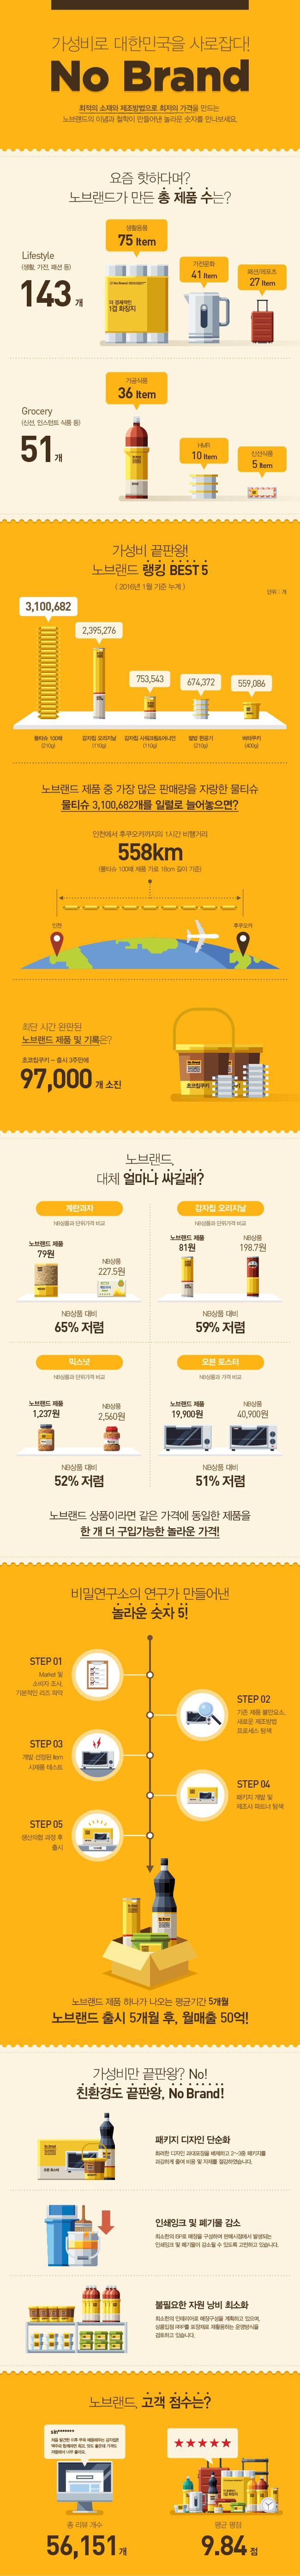 [Infographic] 신세계그룹 - 가성비로 대한민국을 사로잡다! No Brand on Behance